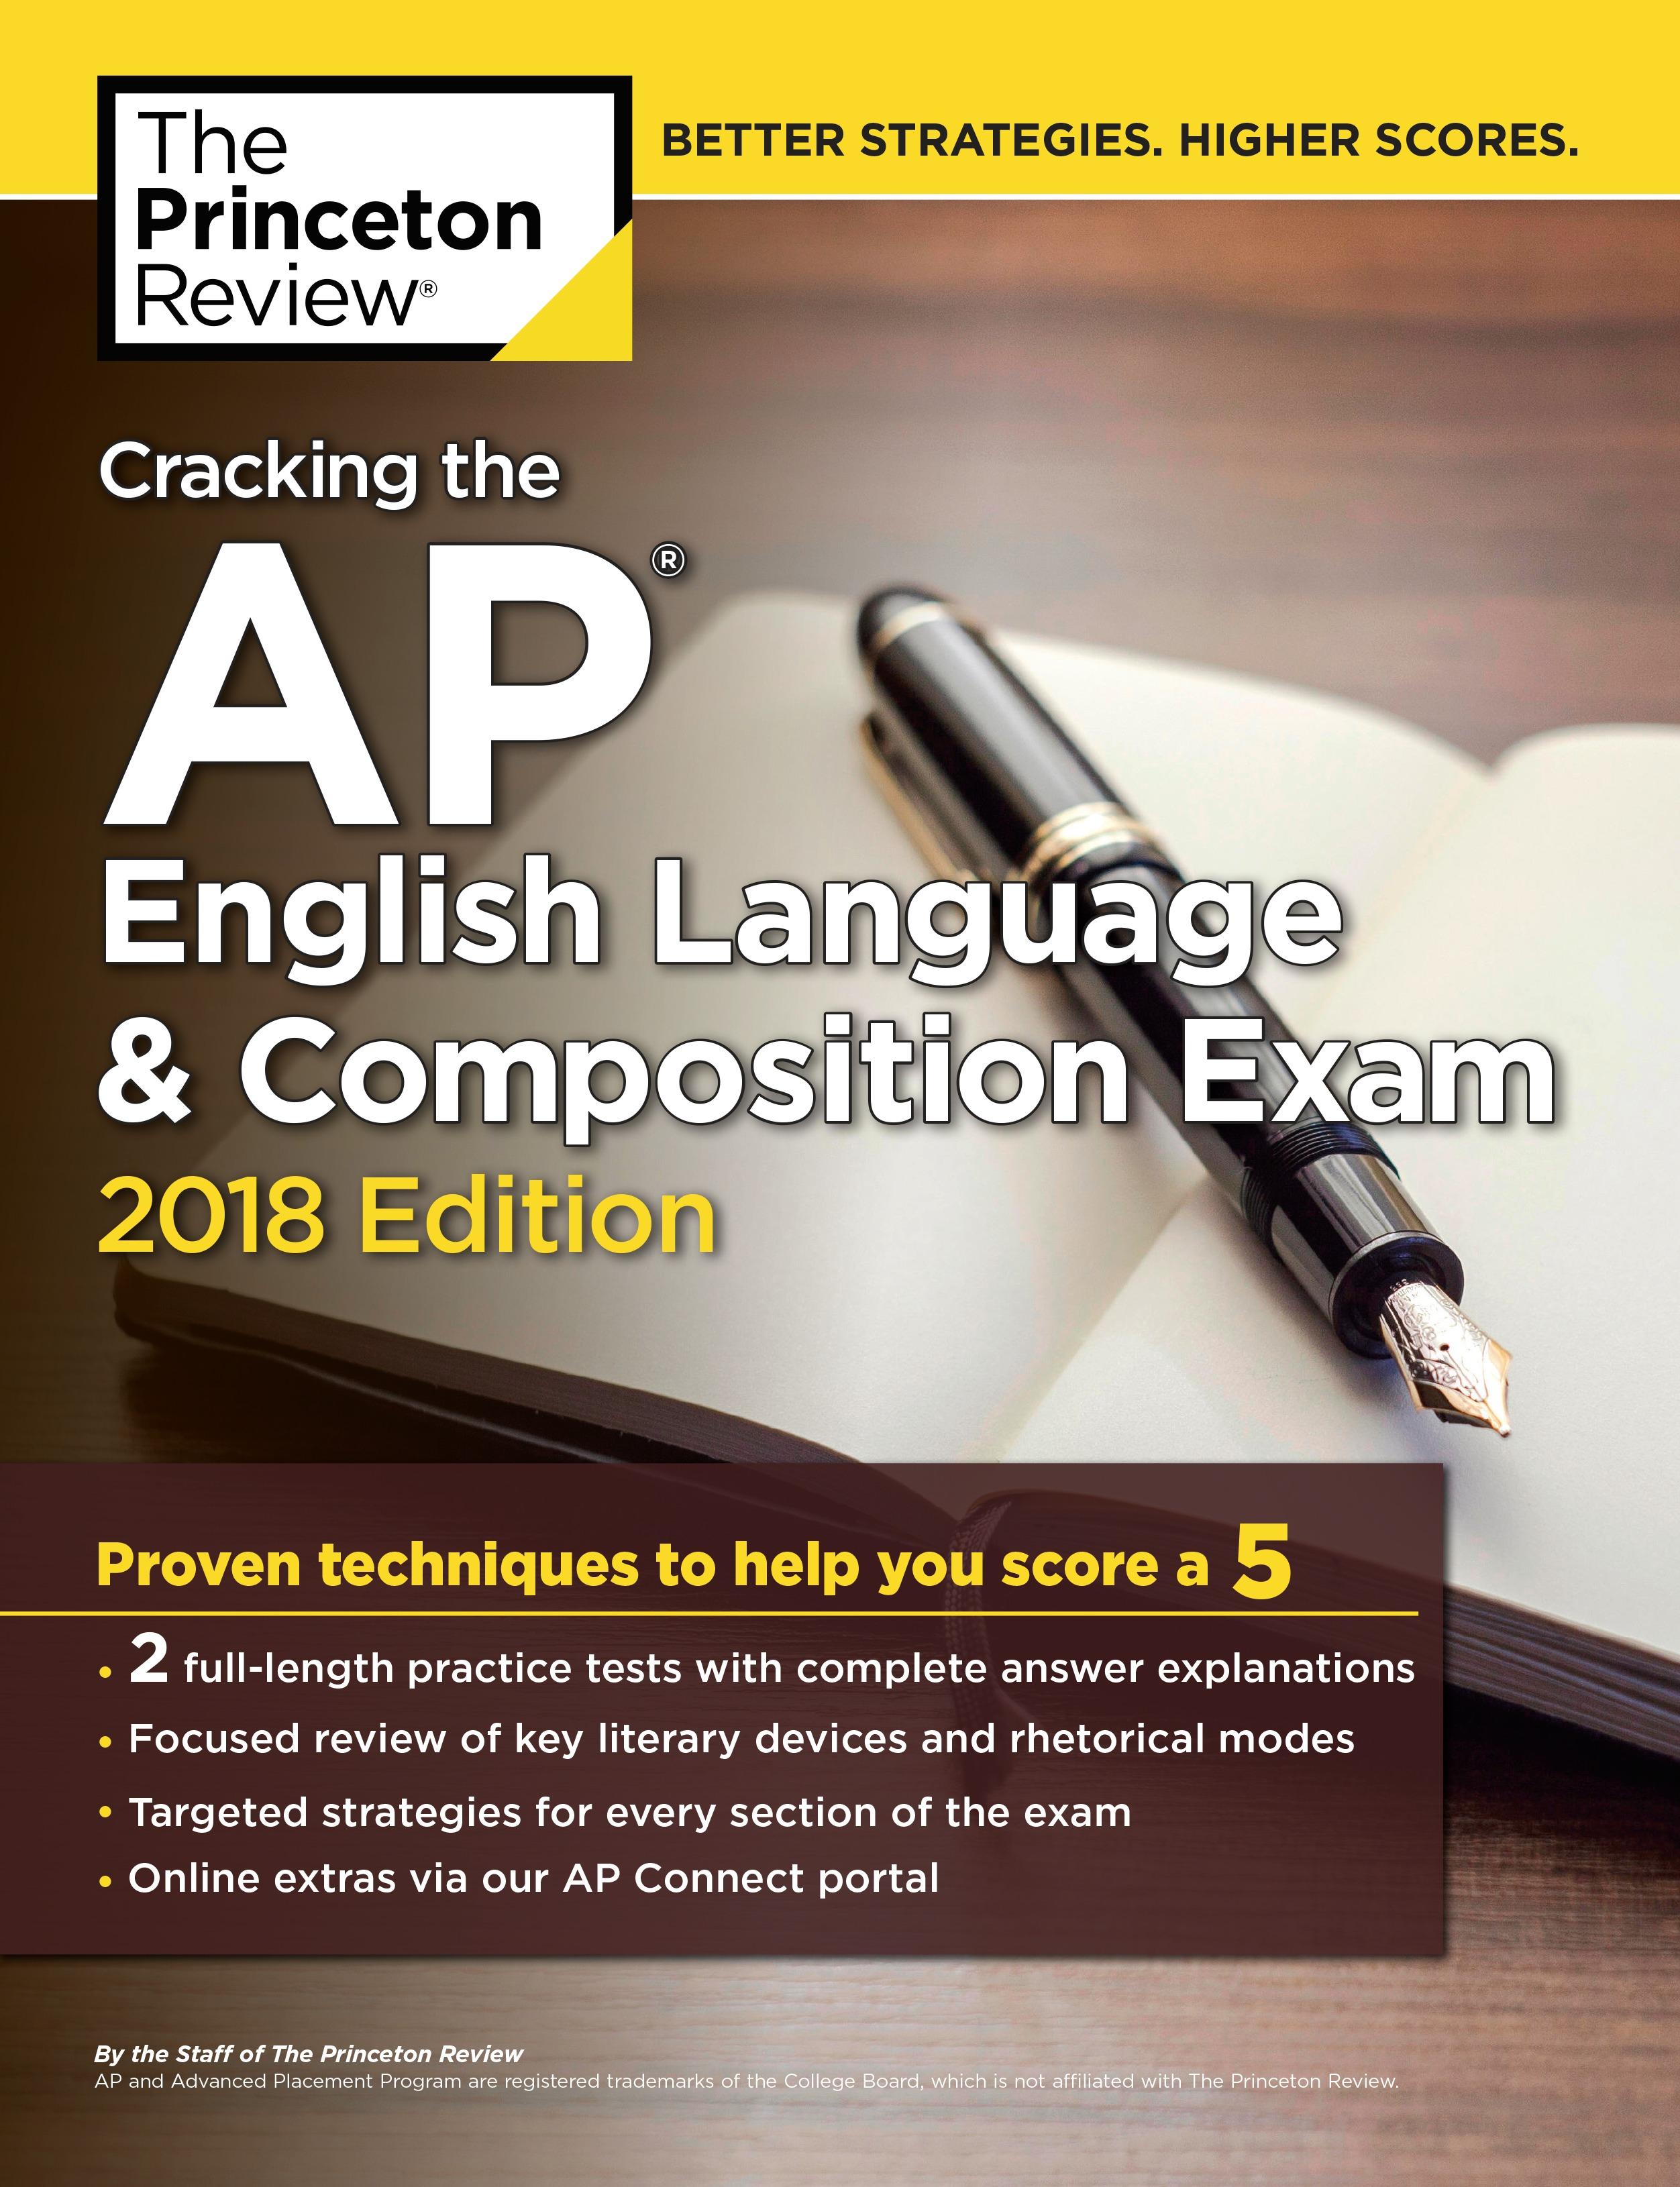 Cracking the AP English Language & Composition Exam, 2018 Edition